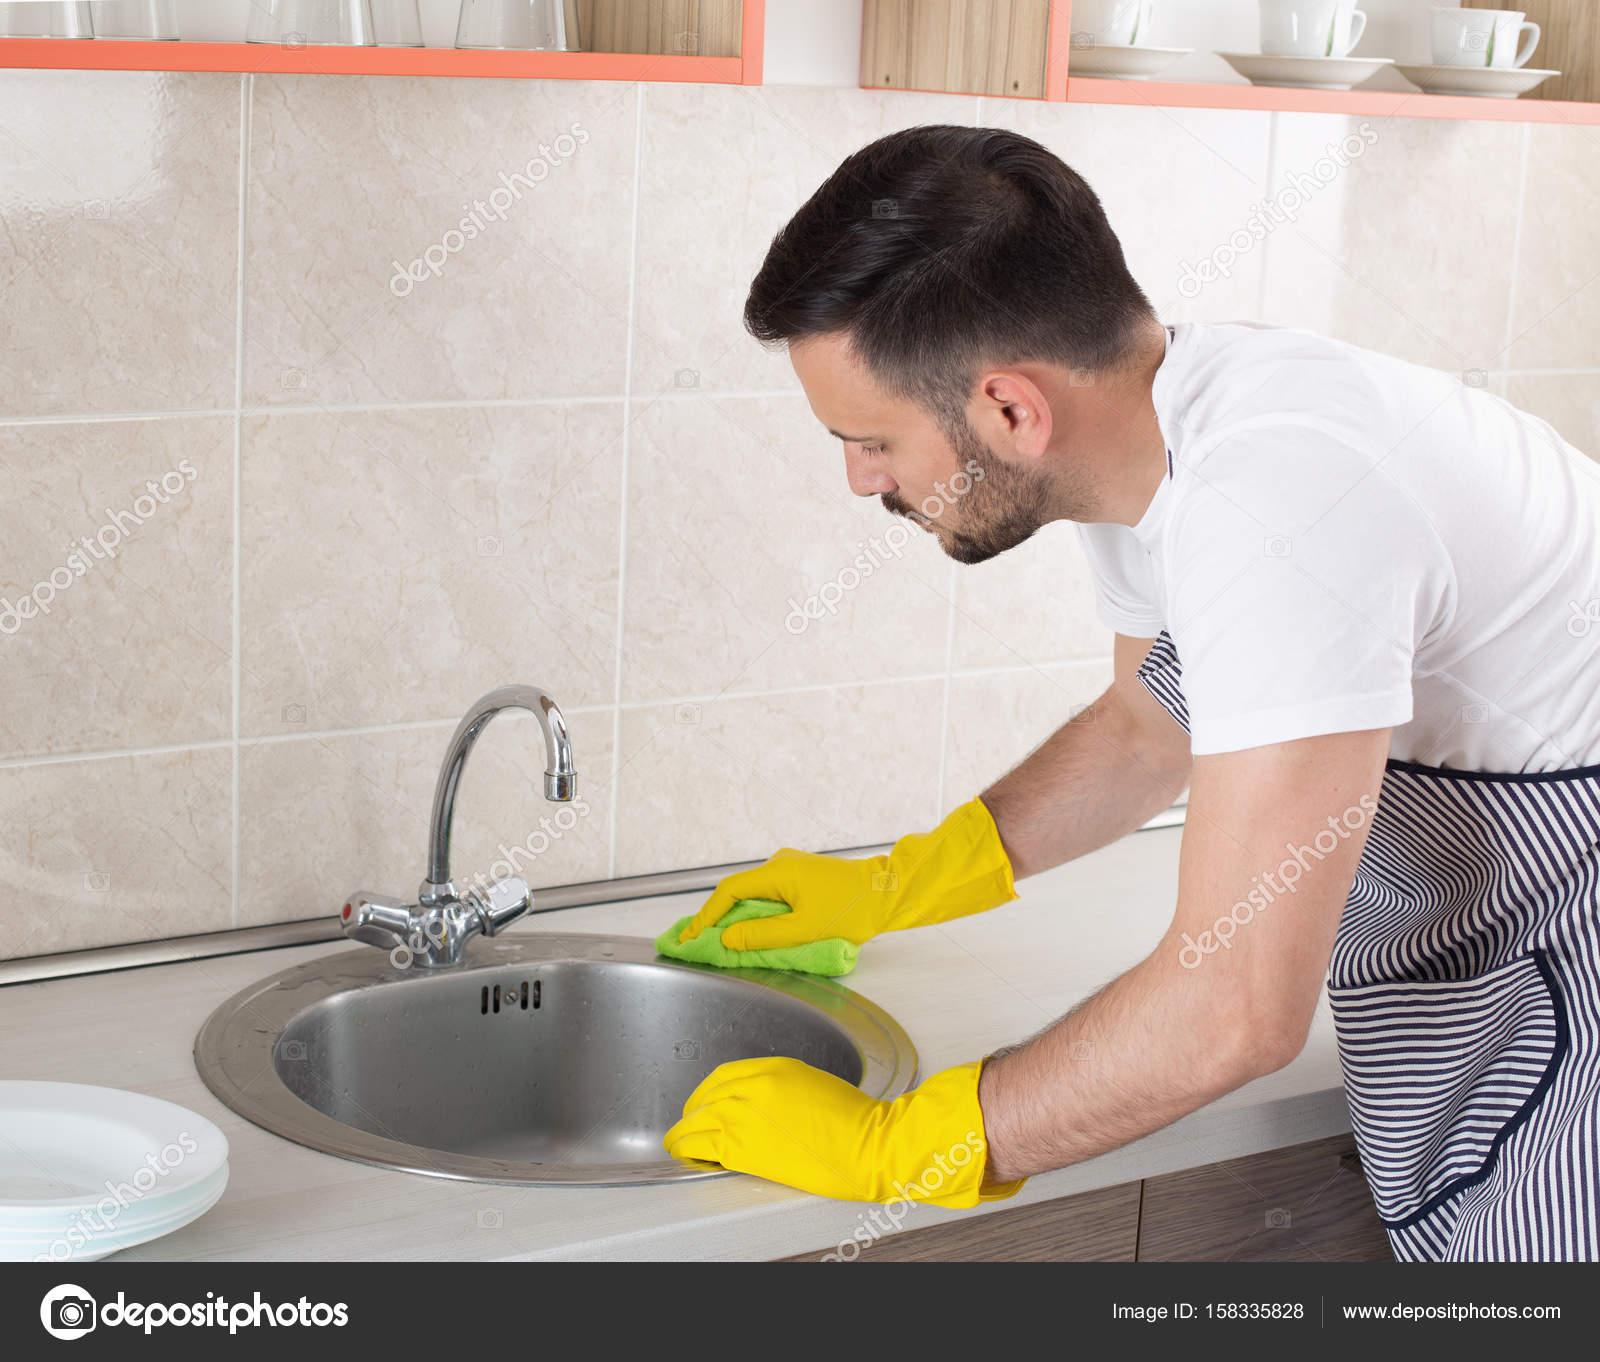 Man cleaning kitchen sink — Stock Photo © budabar #158335828